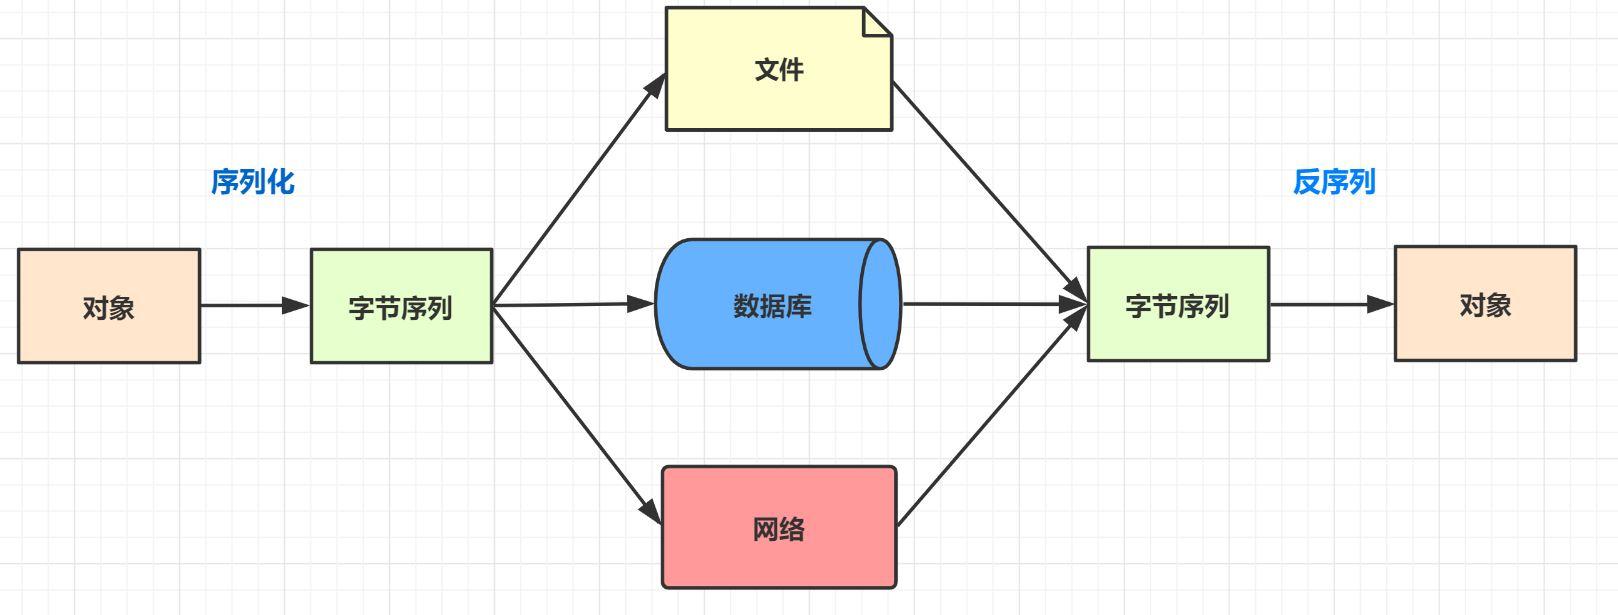 Java程序员必备:序列化全方位解析